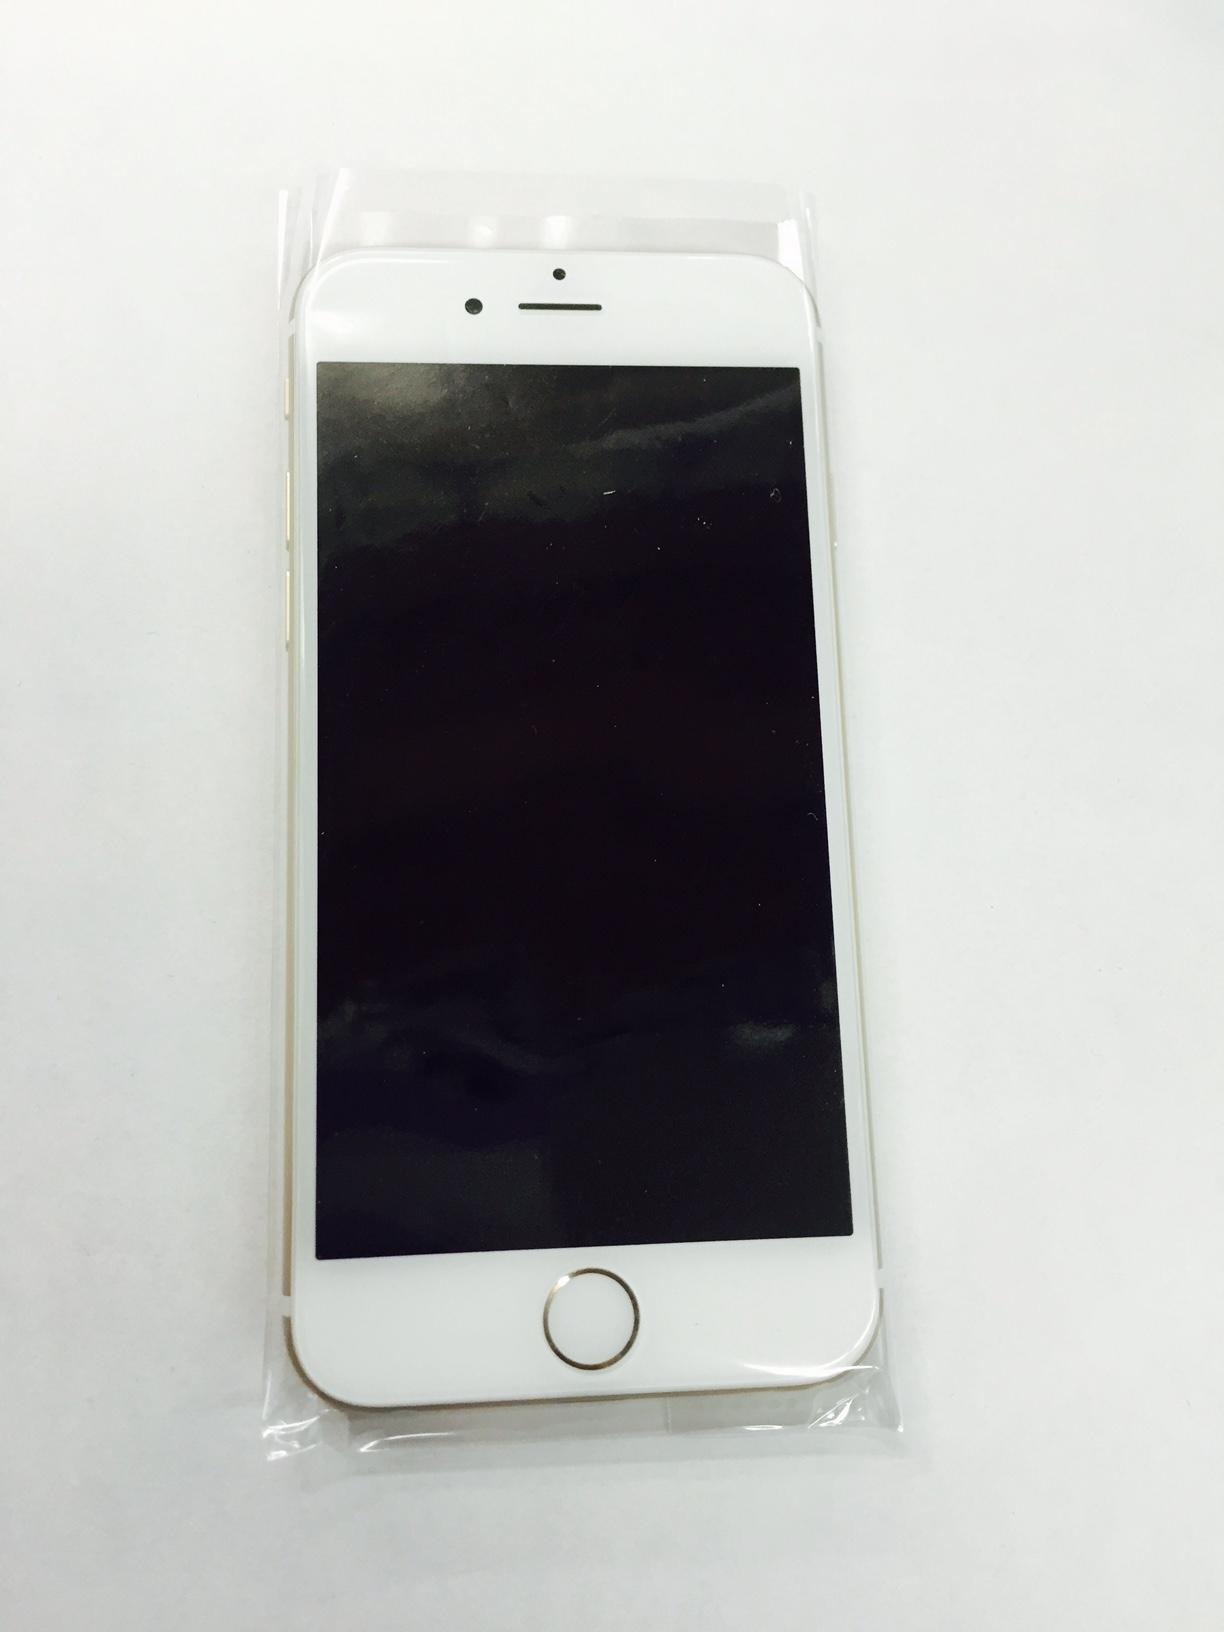 iPhone6 ゴールド 16GB 本体のみ